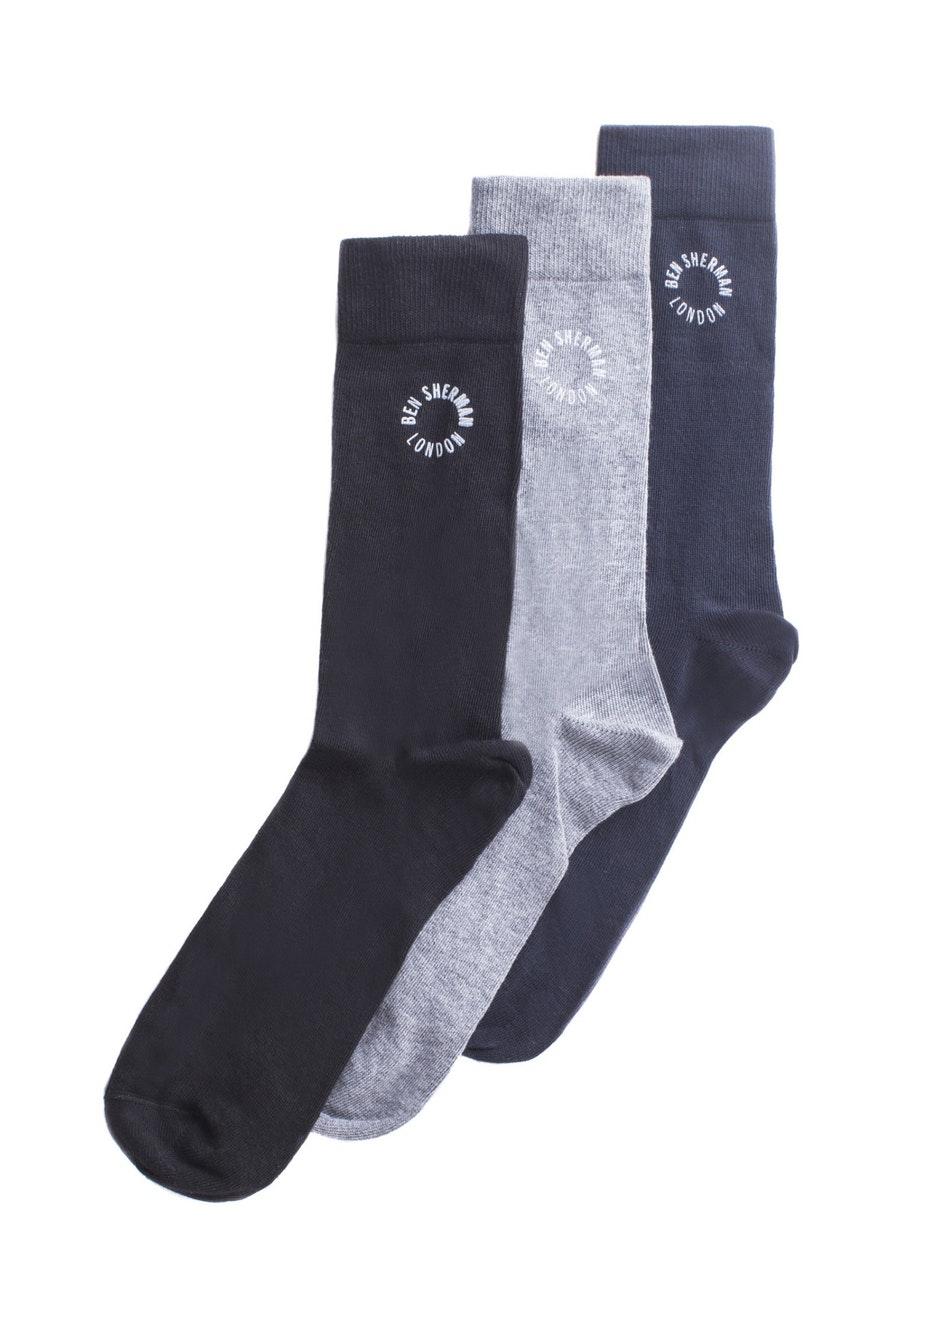 Ben Sherman - Elm 3 Pack Socks - Grey Marl - Black